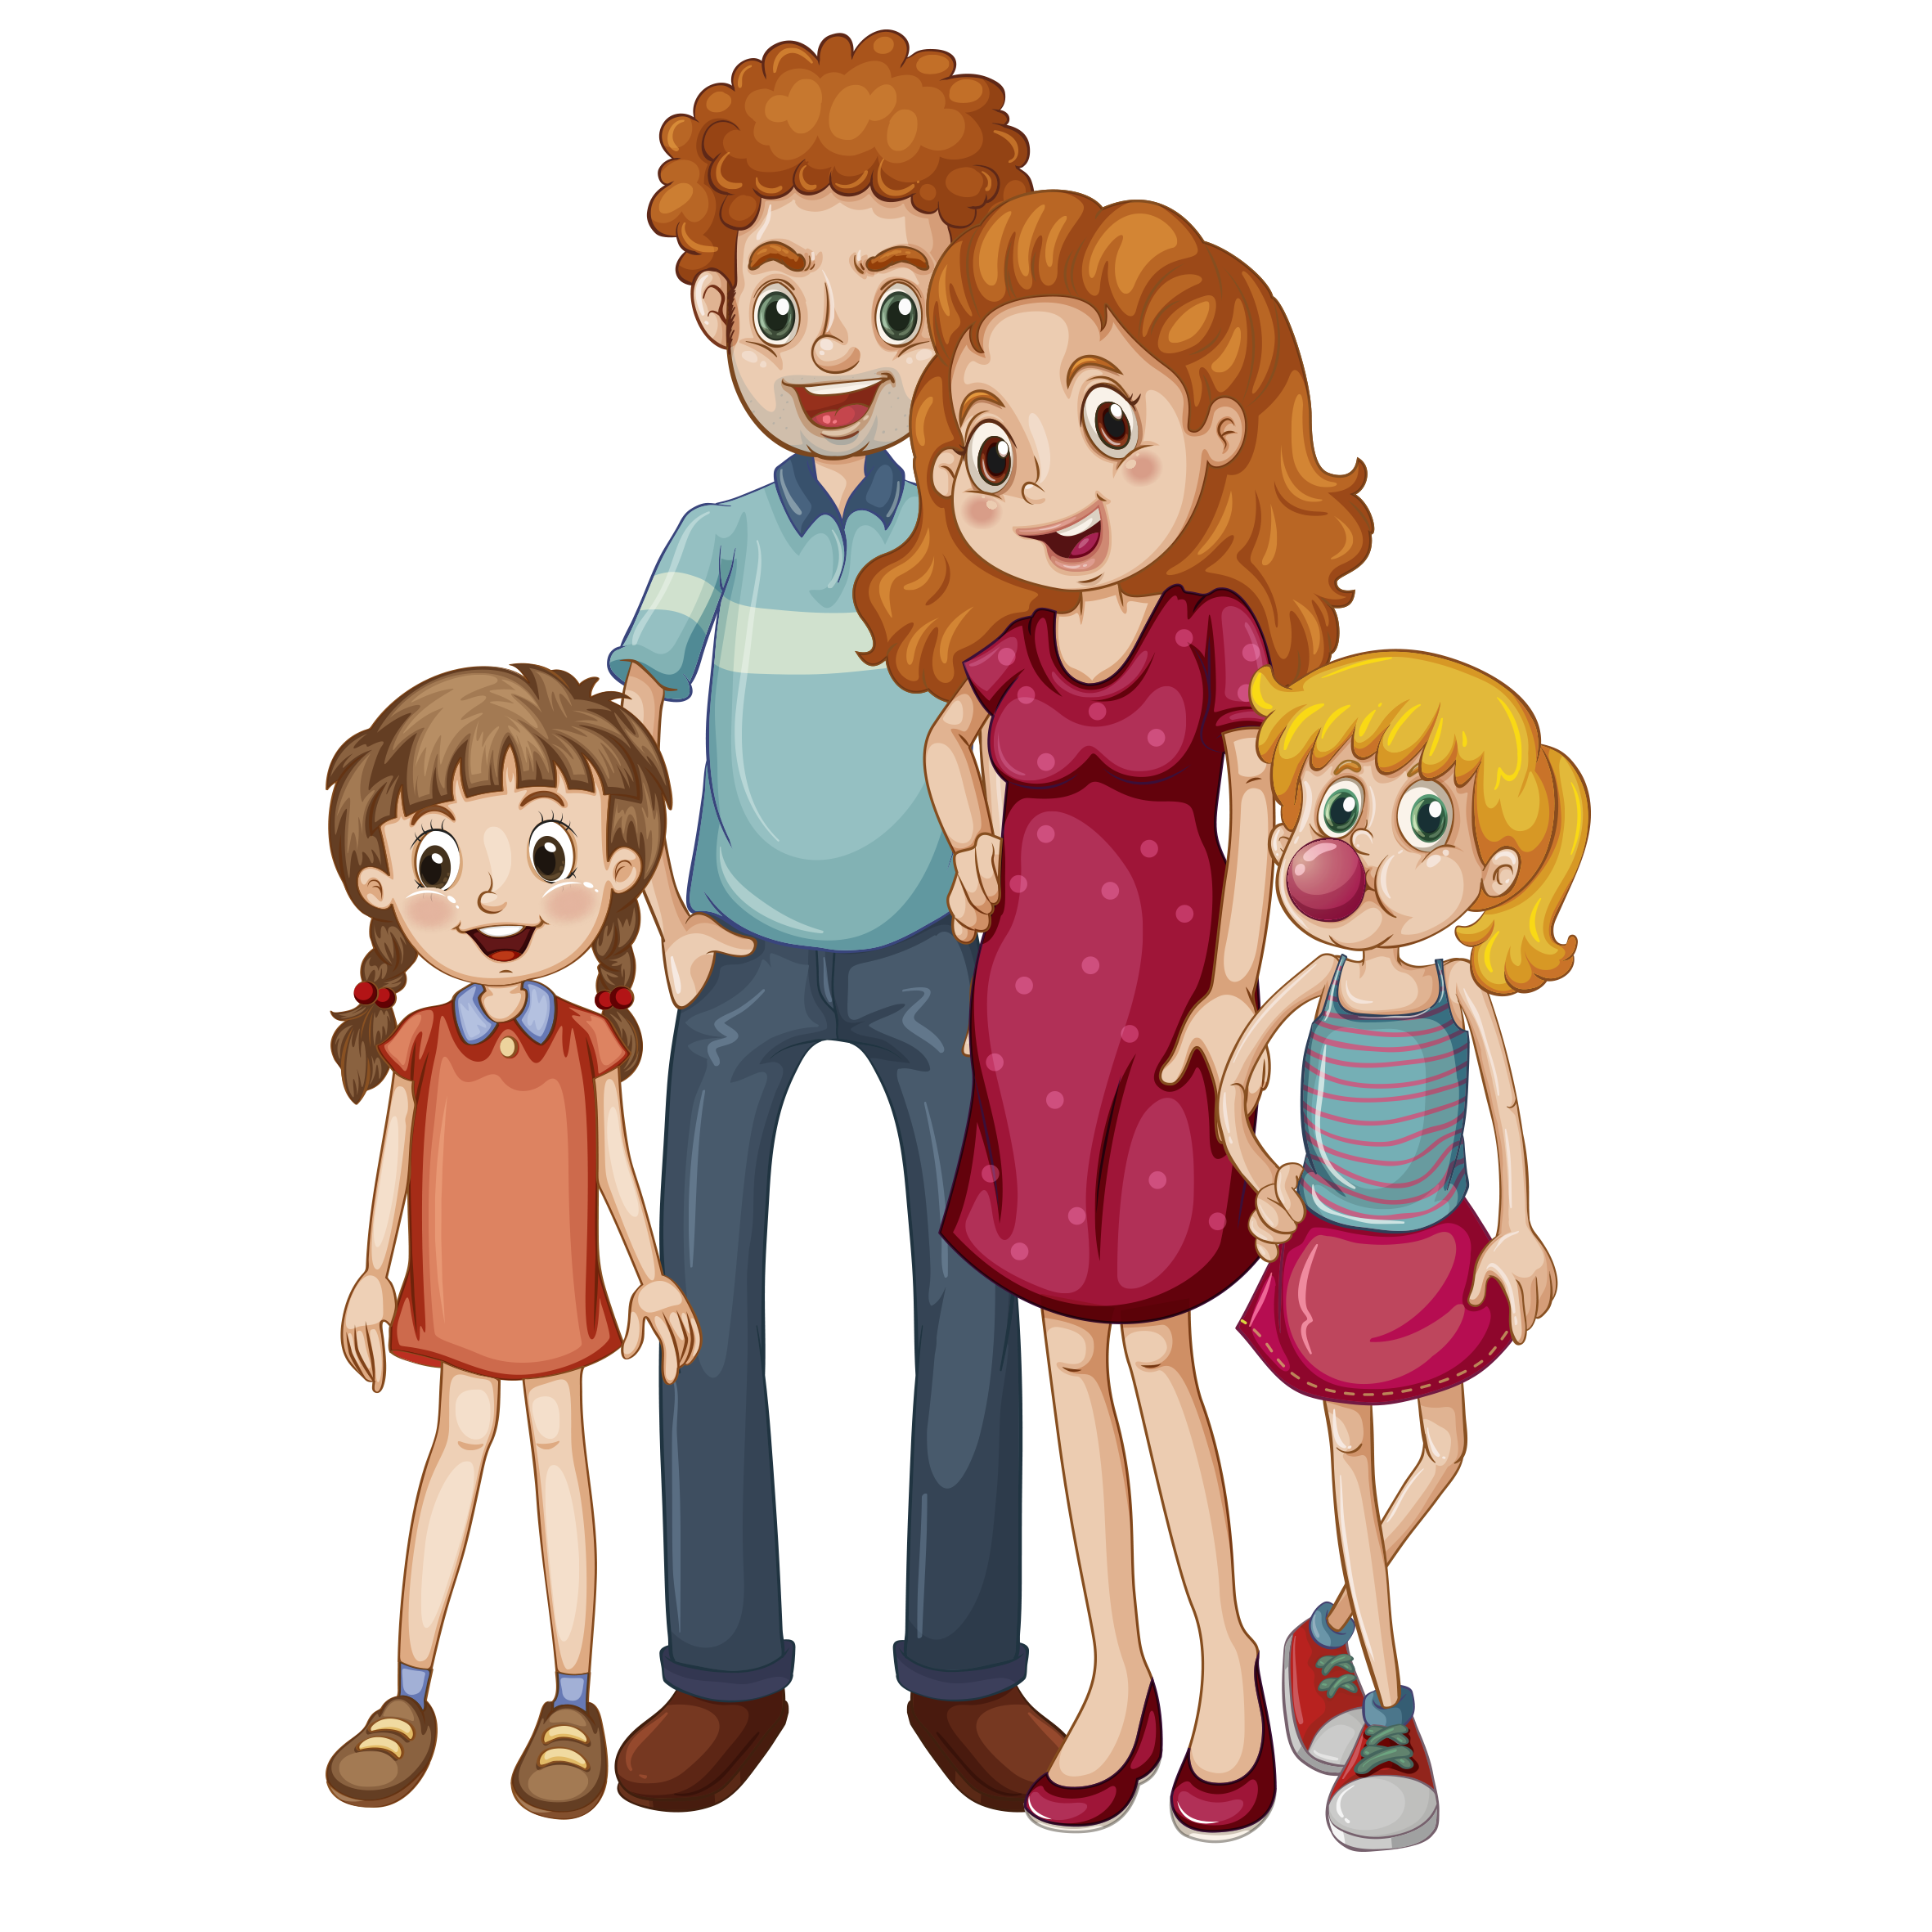 Grupo Familiar 19 Imagenes Para Papa Imagenes De Familia Papa E Hijo